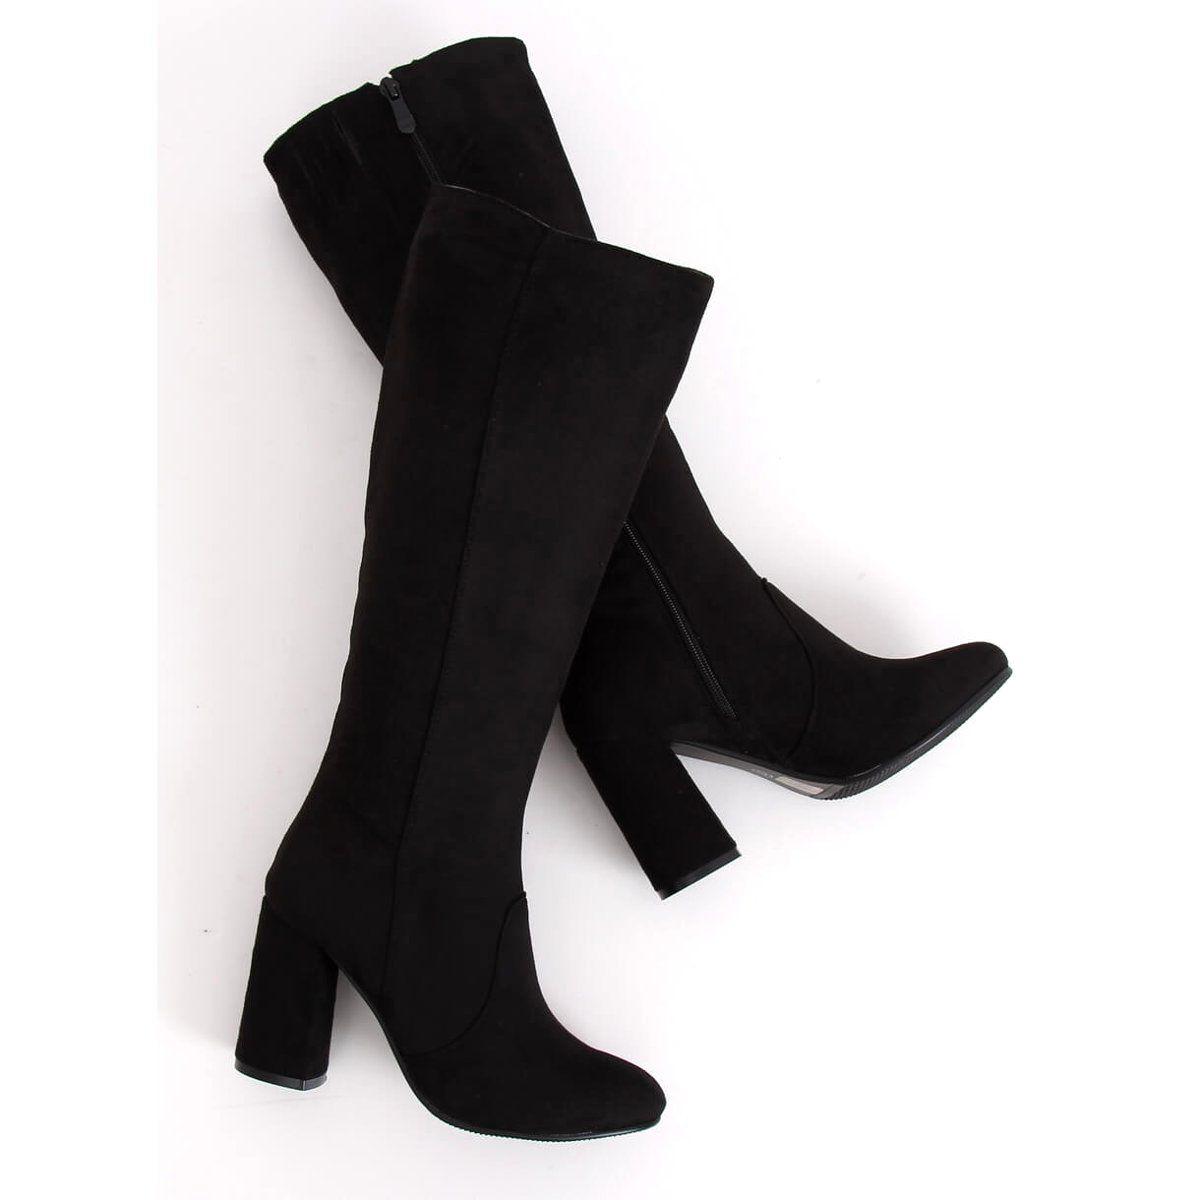 Kozaki Na Obcasie Czarne Pe252p Black Over Knee Boot Boots Shoes